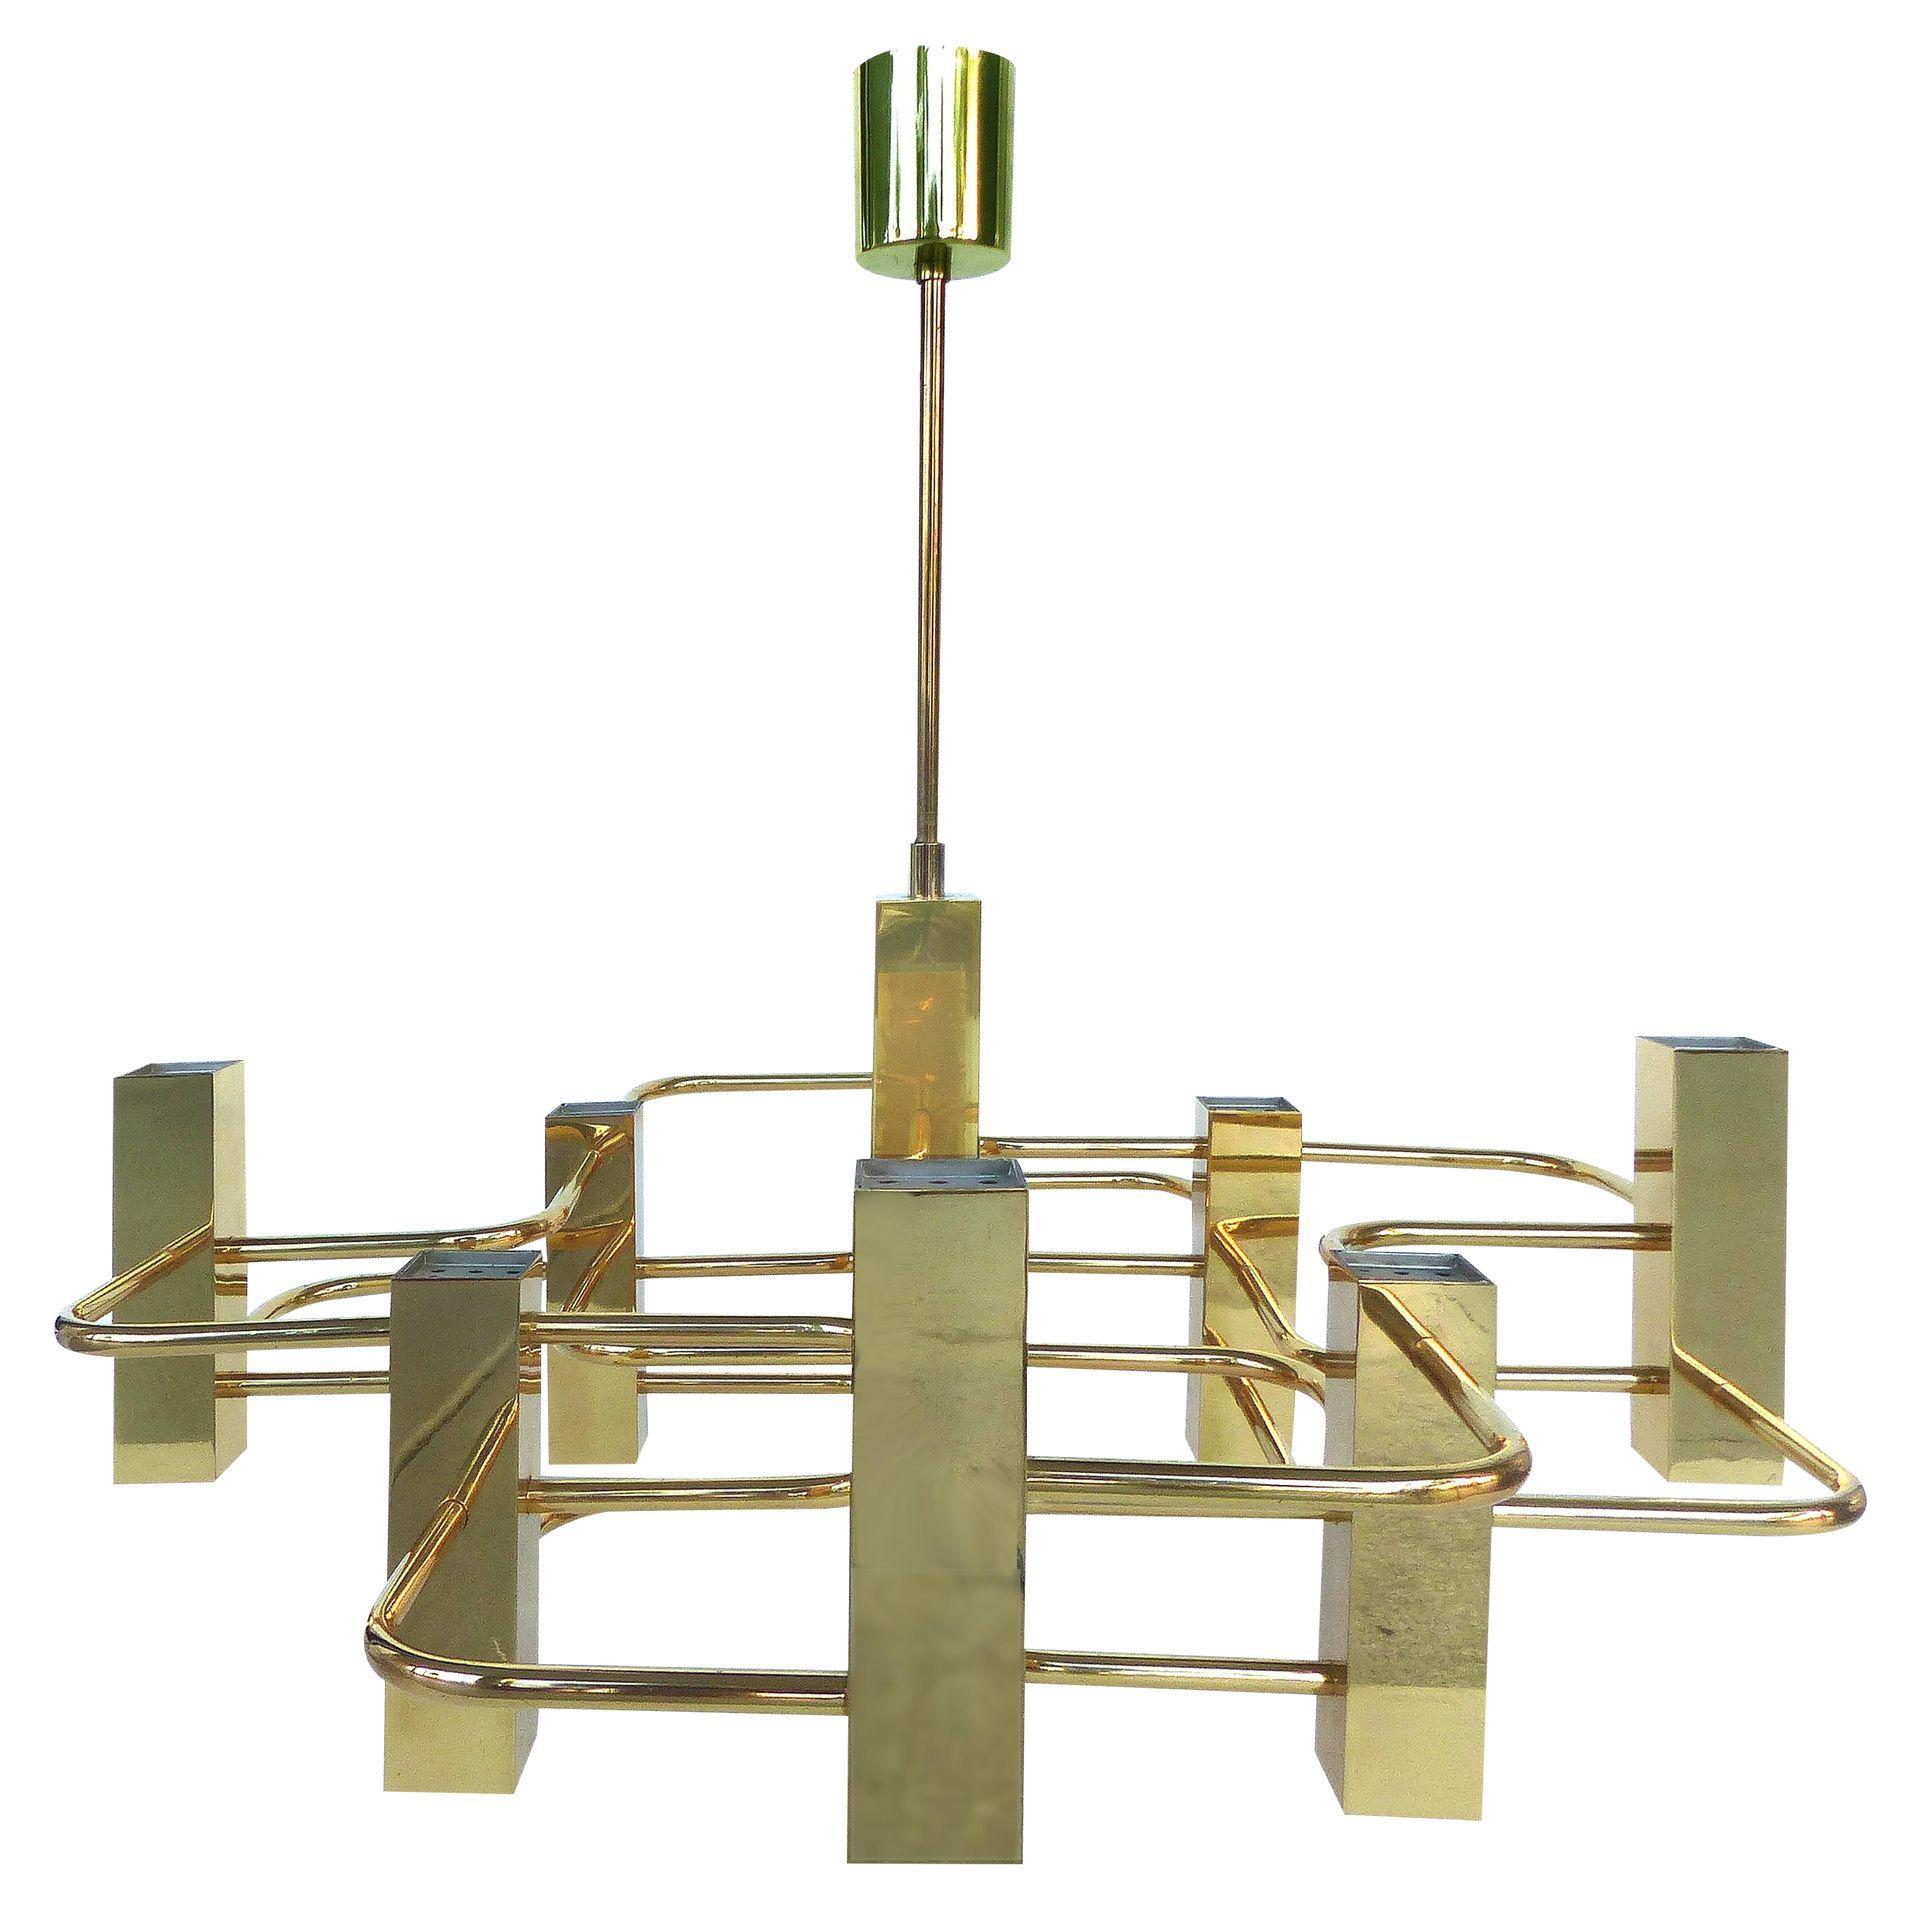 Gaetano sciolari brass mid century modern chandelier modernism gaetano sciolari brass mid century modern chandelier mozeypictures Choice Image